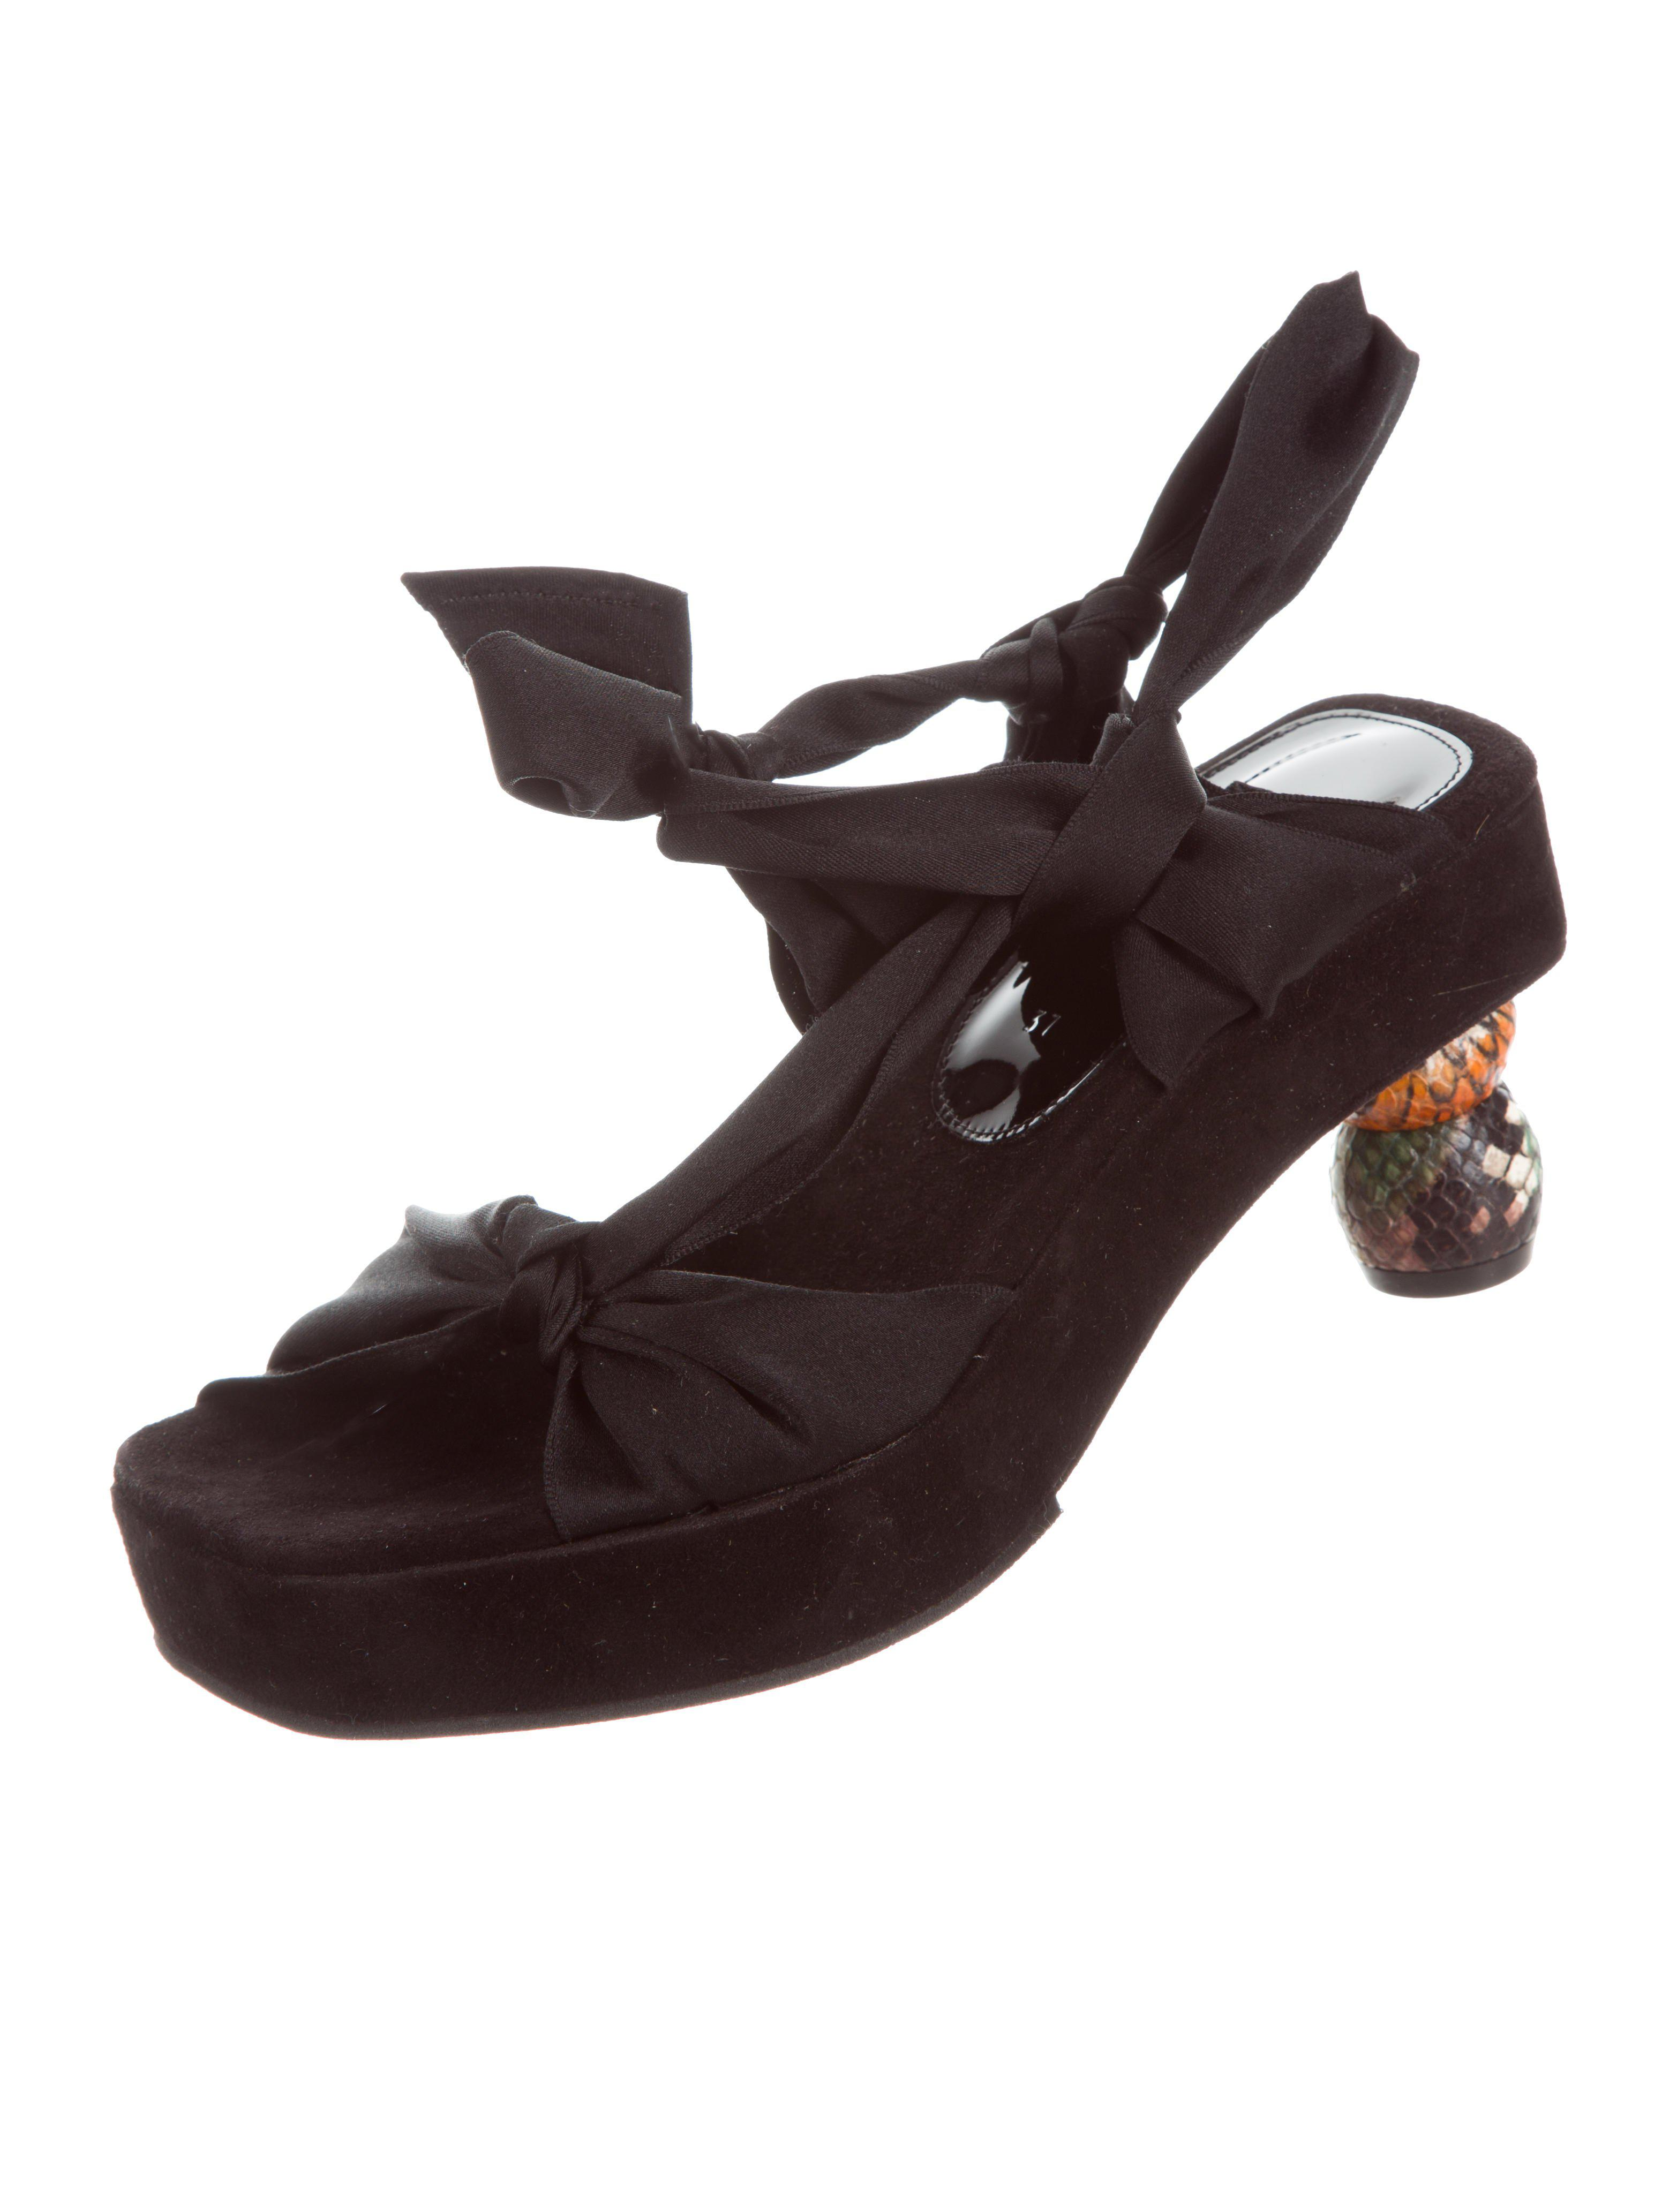 sast cheap online Dries Van Noten Satin Platform Sandals w/ Tags sale online cheap discount countdown package outlet pre order q8ct5T